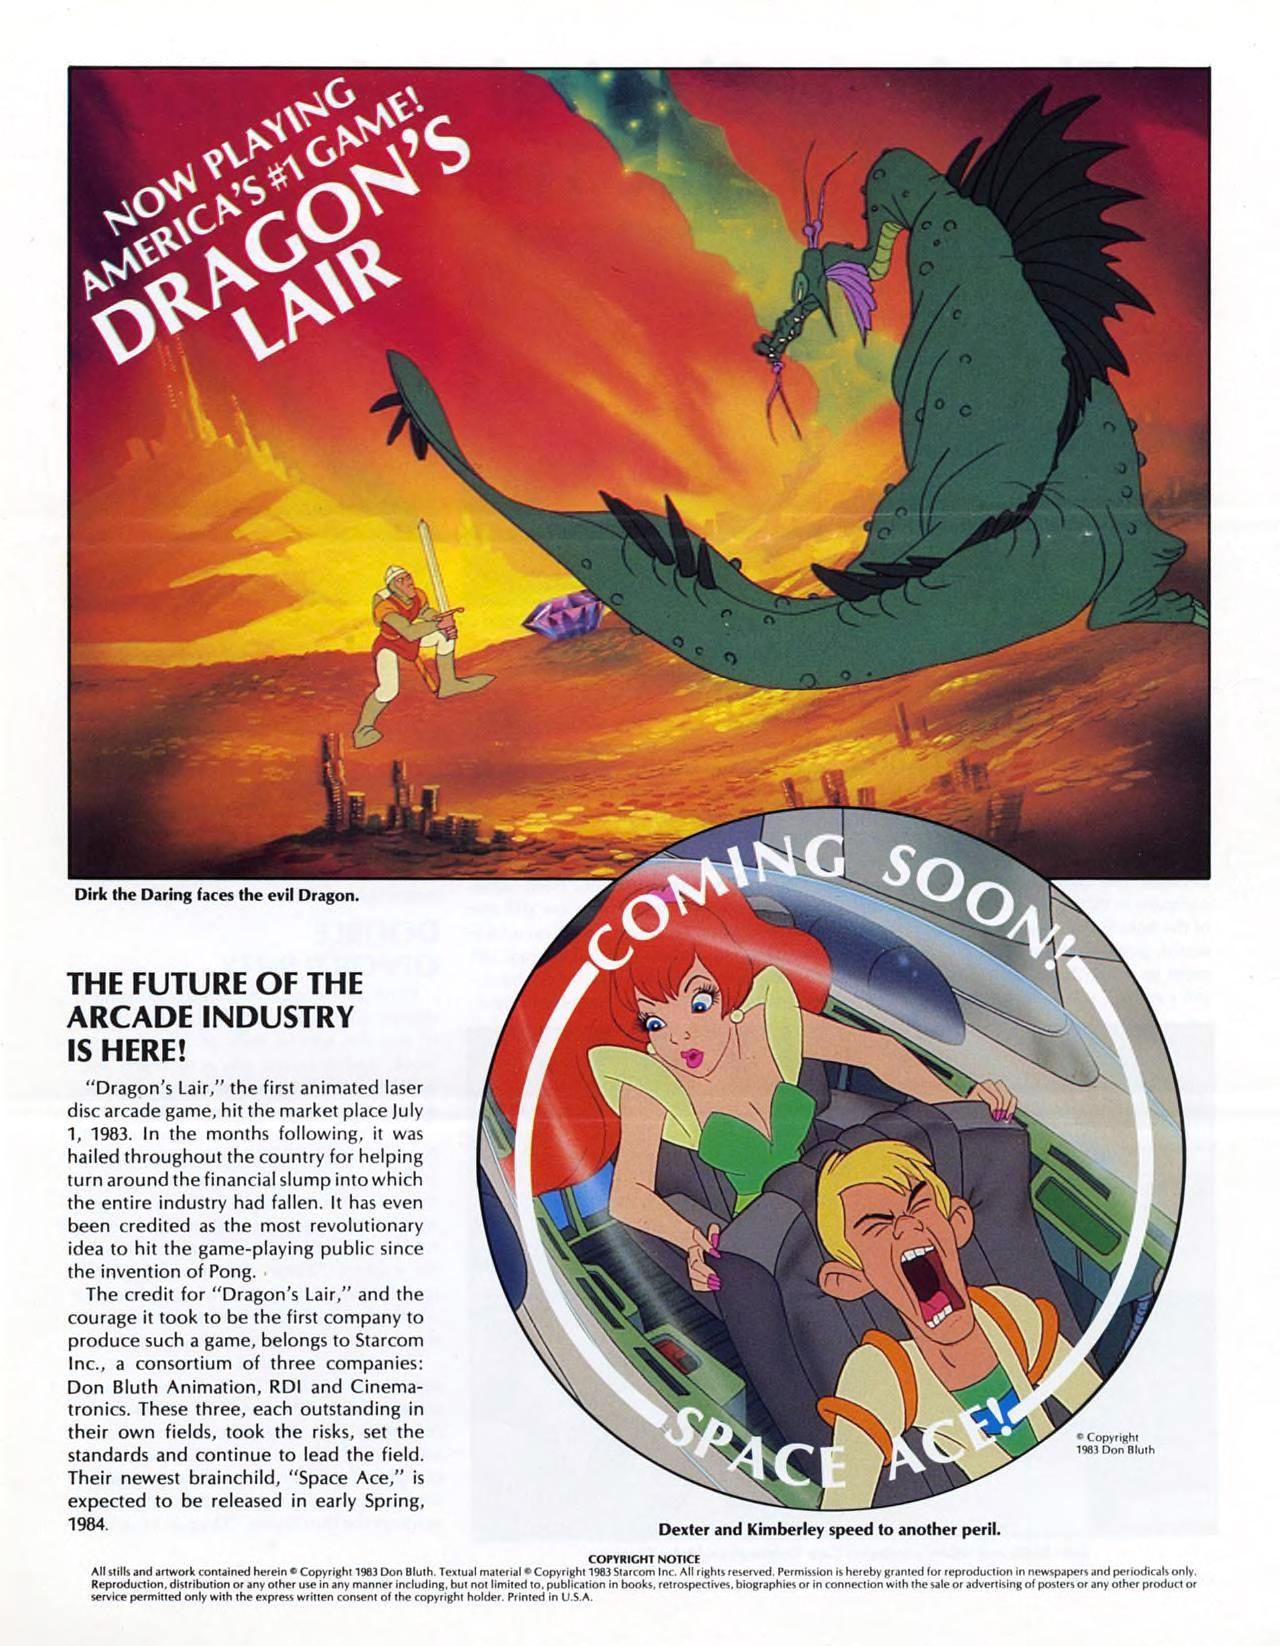 Dragons Lair, an arcade laserdisc game by Starcom